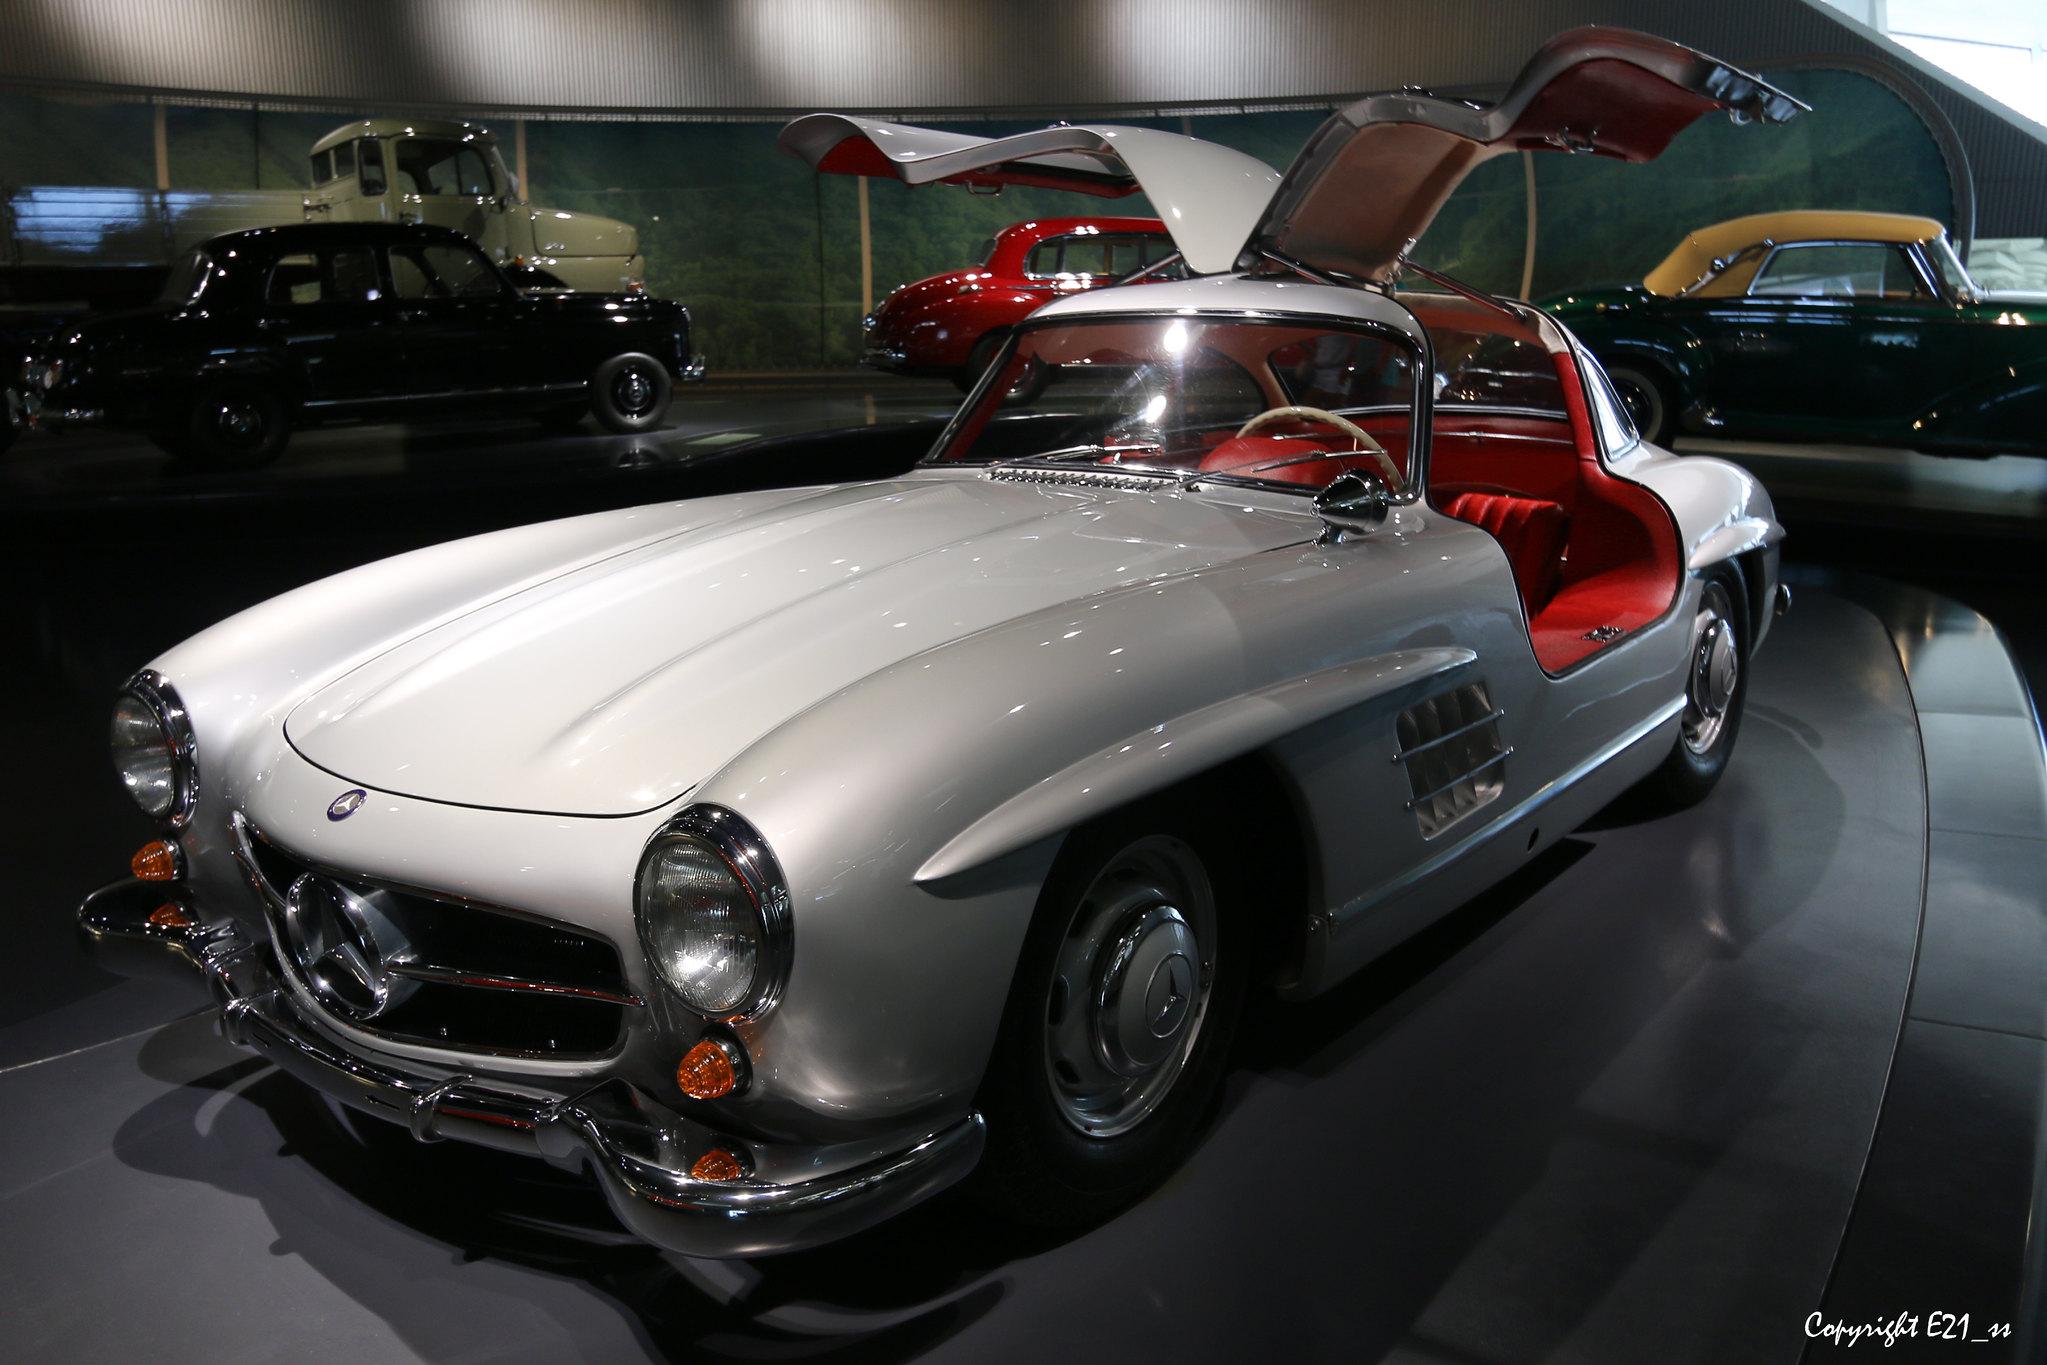 E21s germany part 8 nice car mercedes benz 300sl gullwing for Mercedes benz germany internship